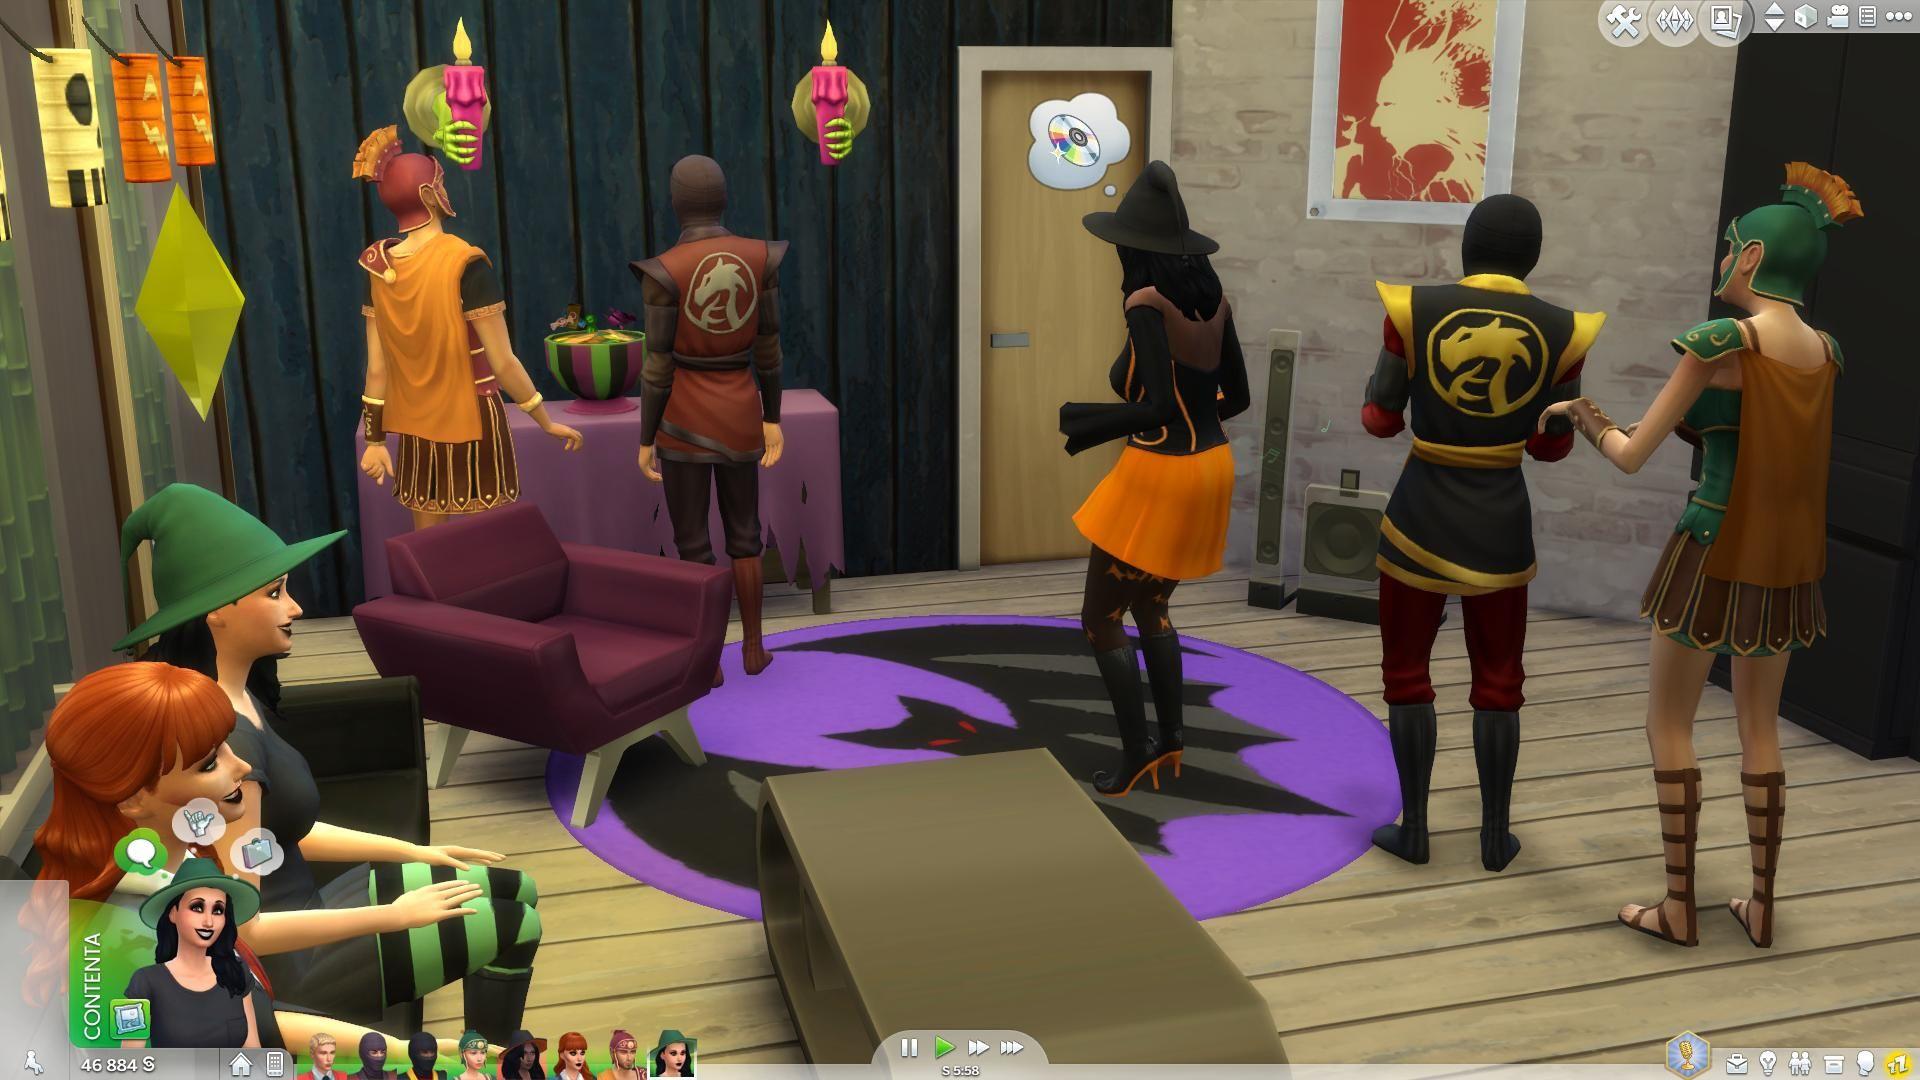 Expansion sims 4 #Halloween #halloween2015